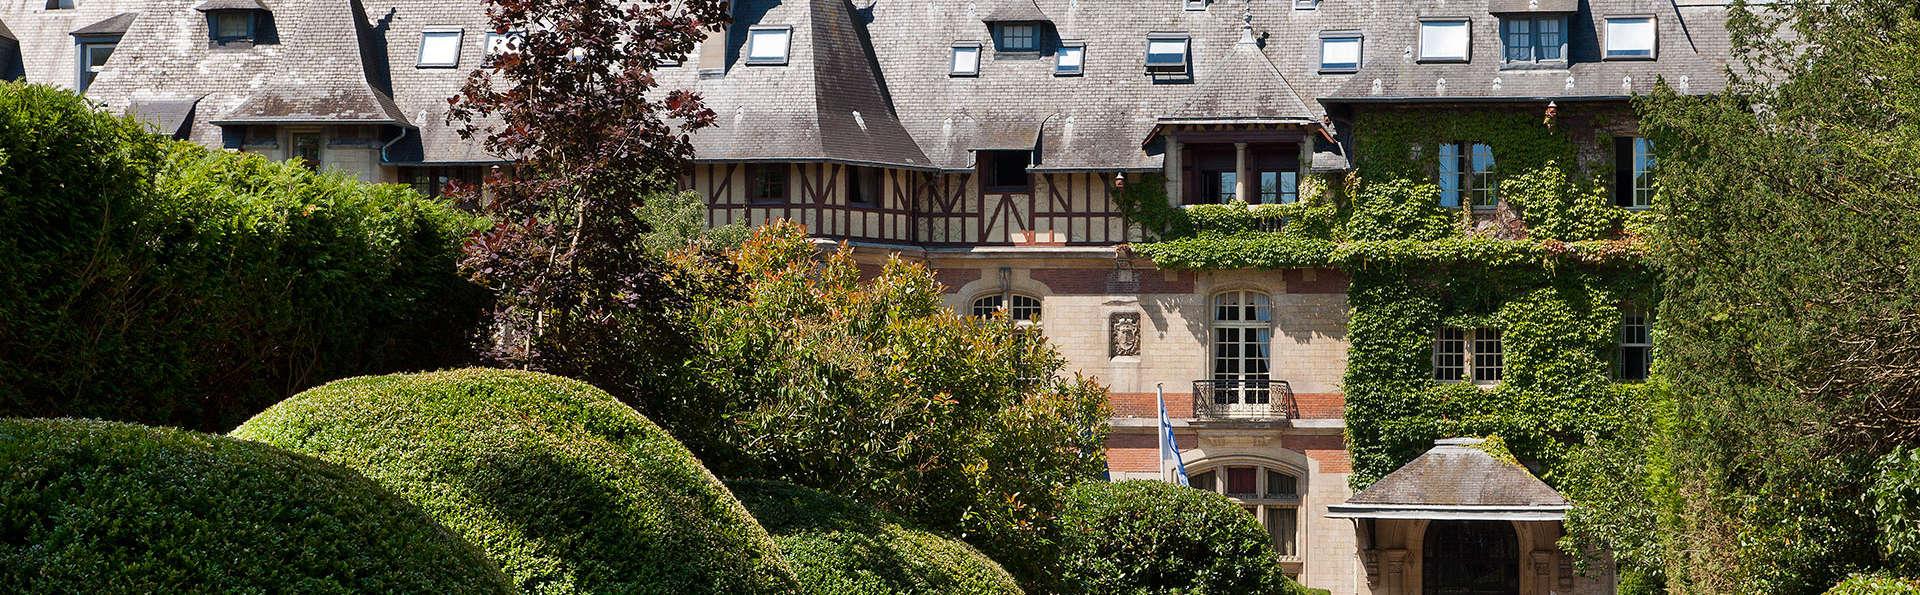 Château de Montvillargenne  - EDIT_front2.jpg